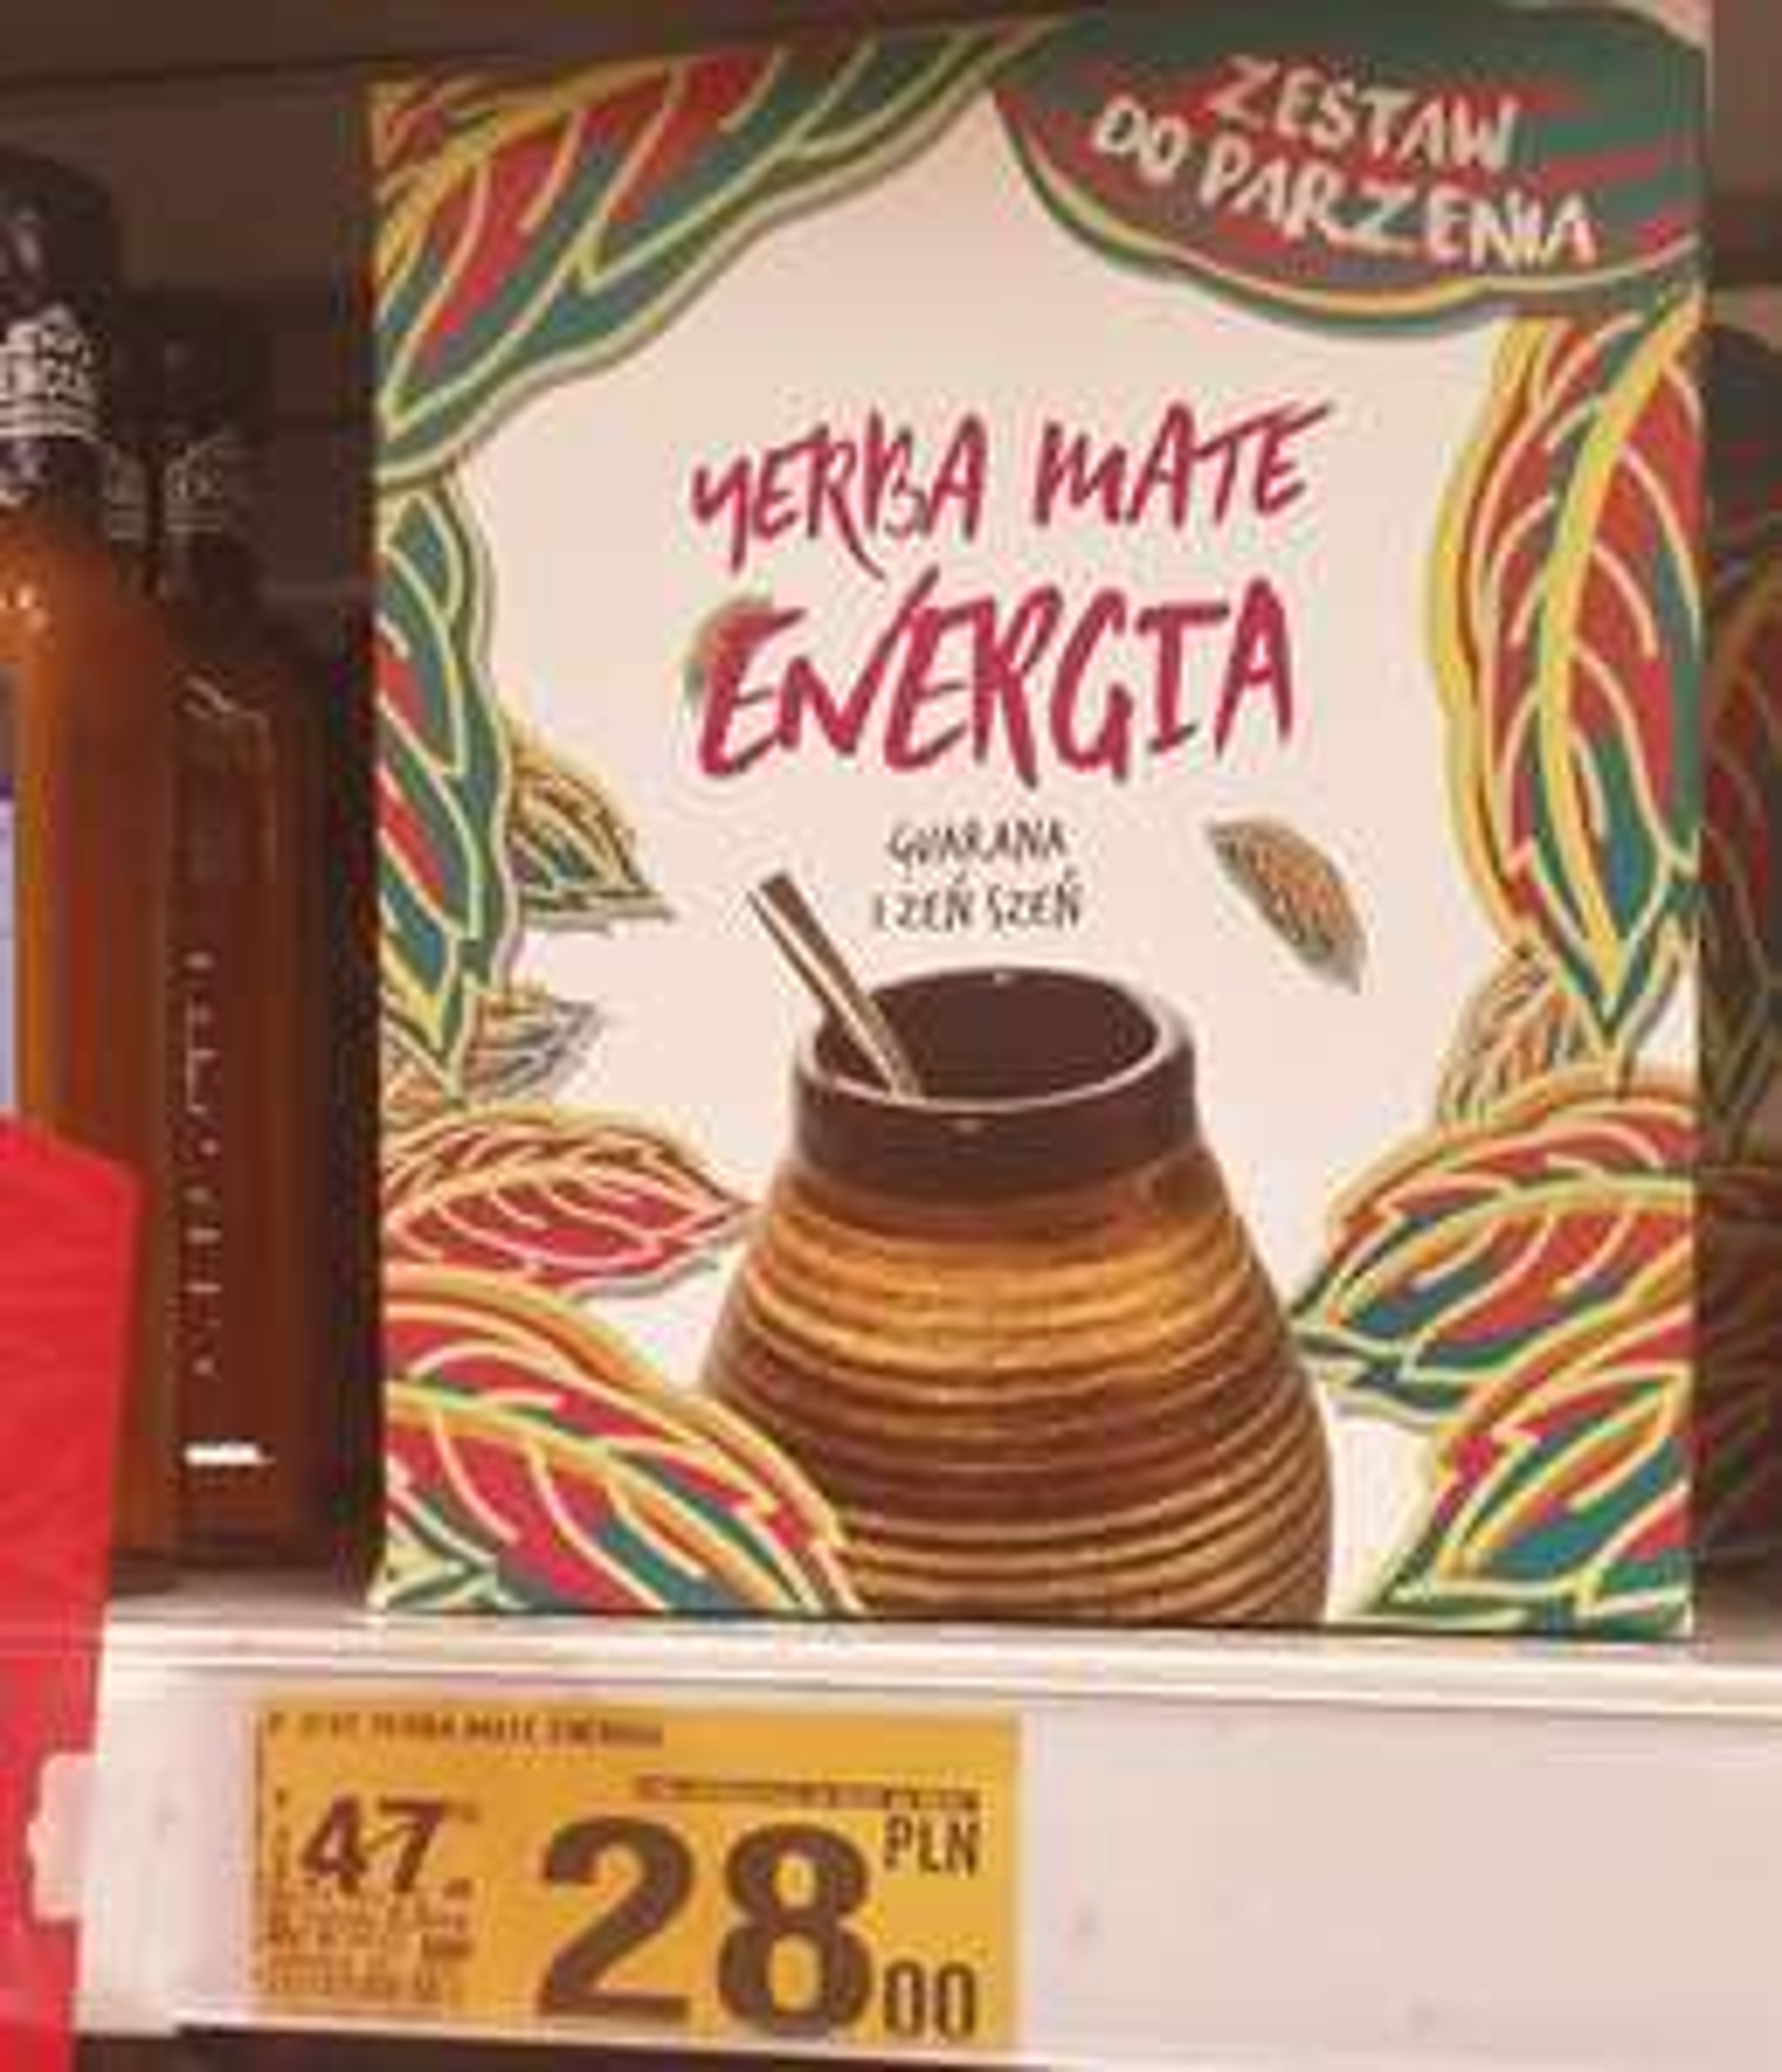 Zestaw Energia 150g+bombilla +naczynie - Auchan Komorniki